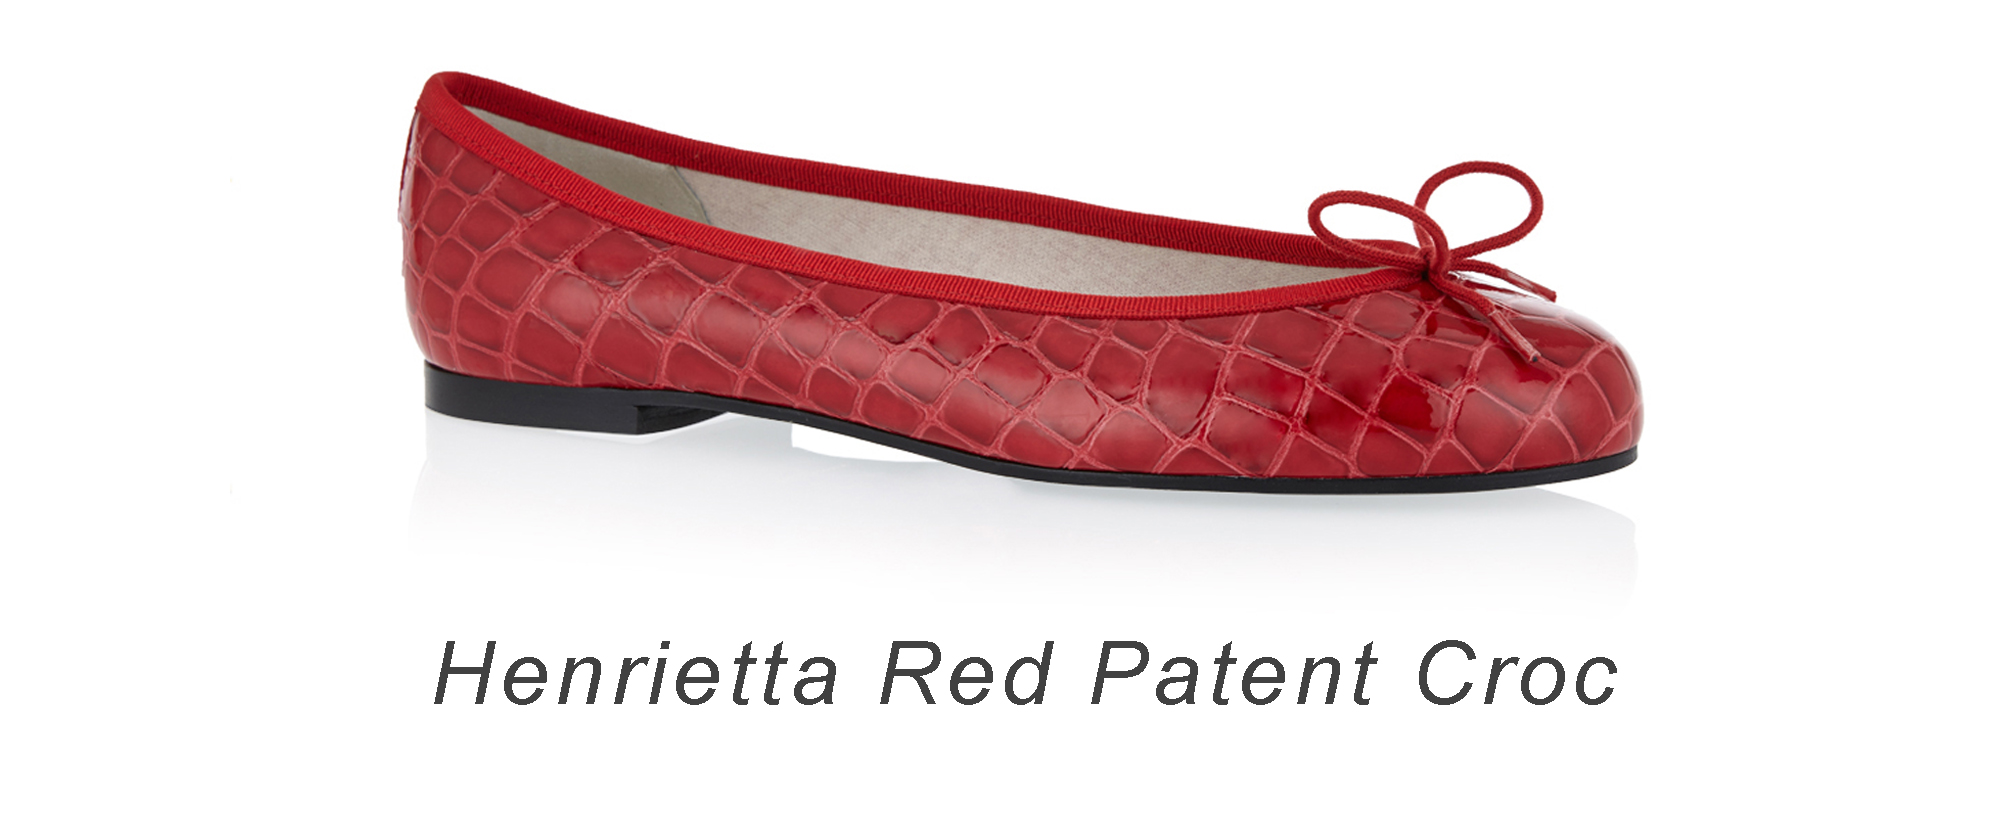 French Sole Henrietta red patent croc